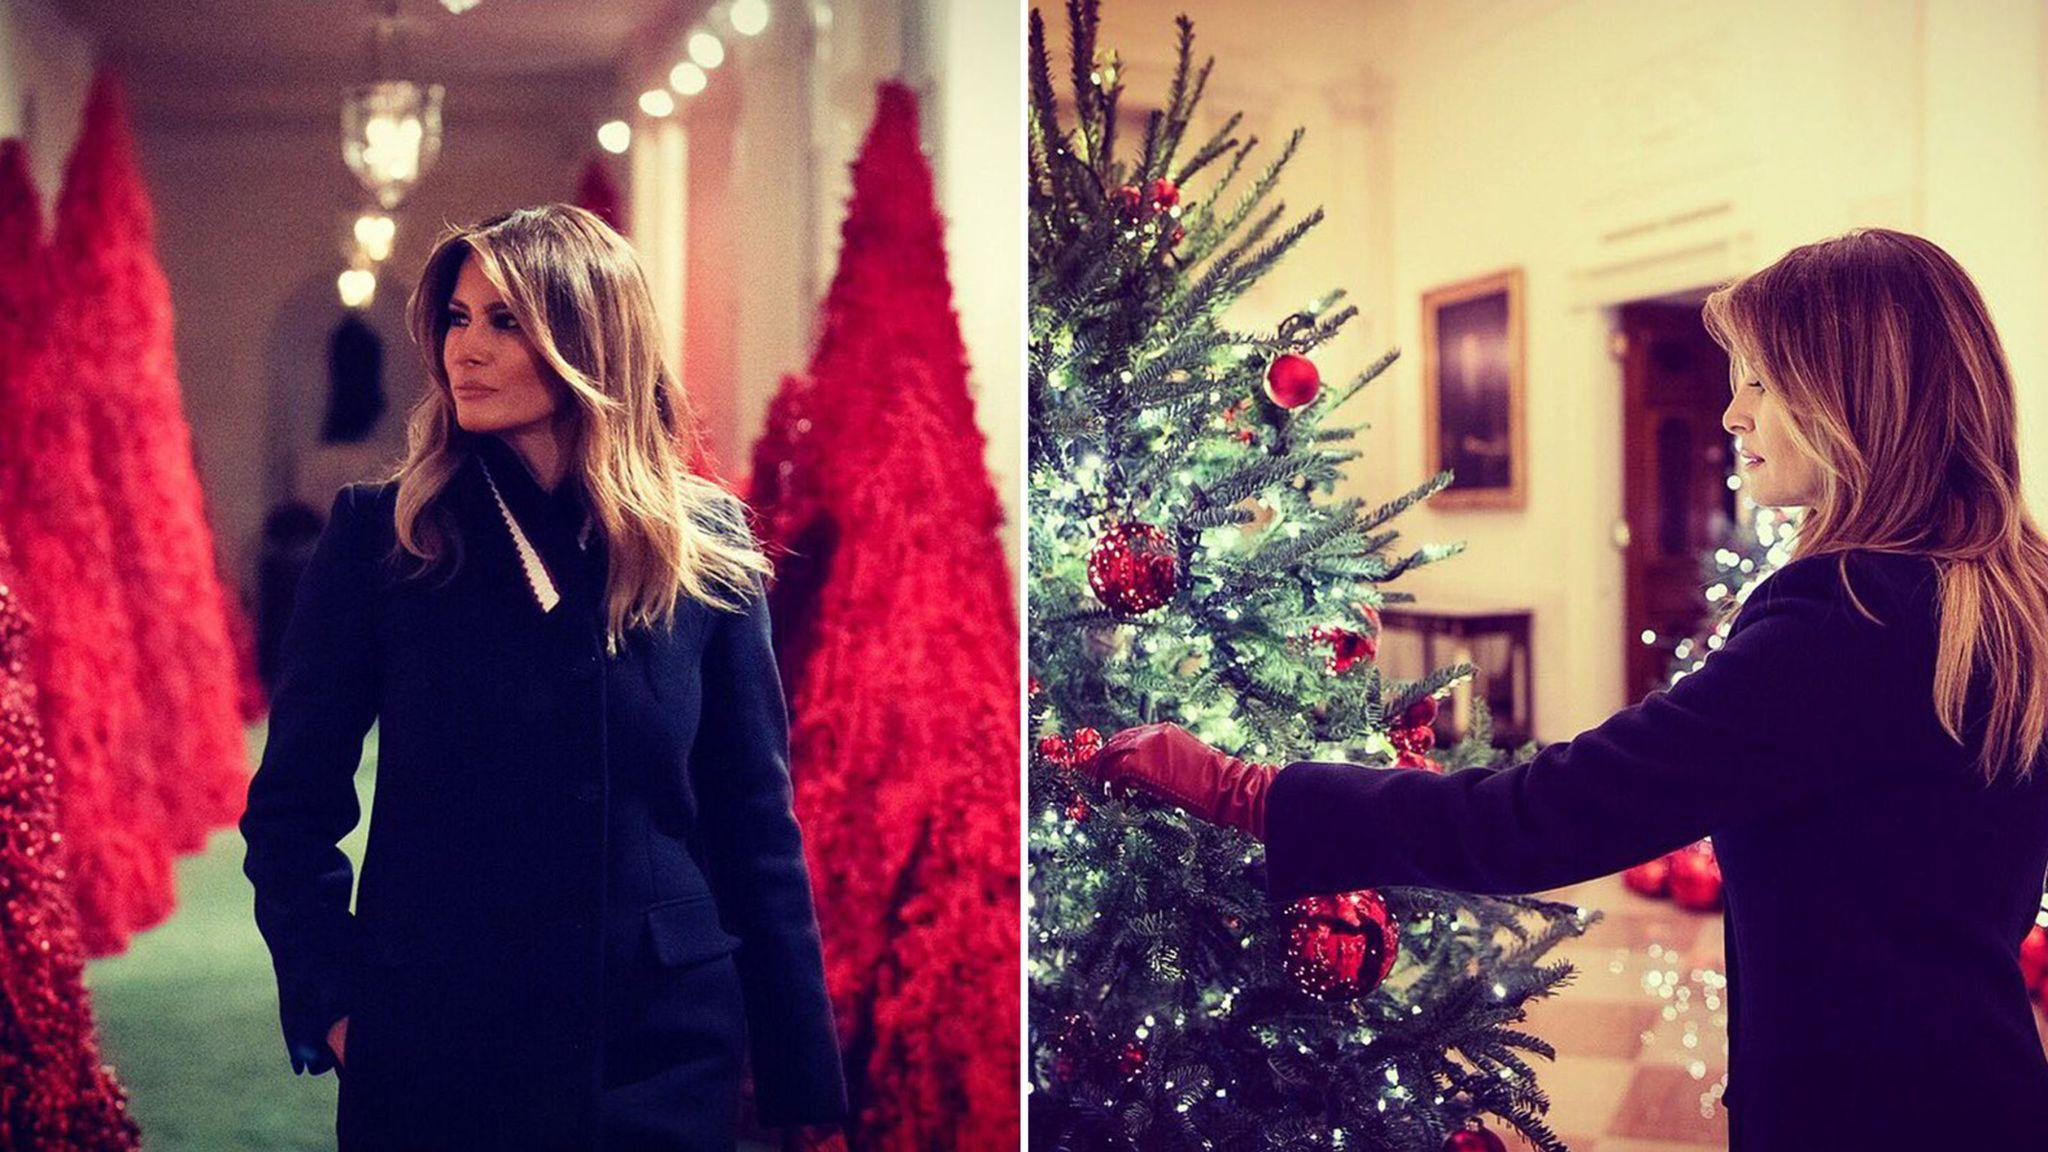 Melania Trump S White House Christmas Decorations Divide Opinion Us News Sky News